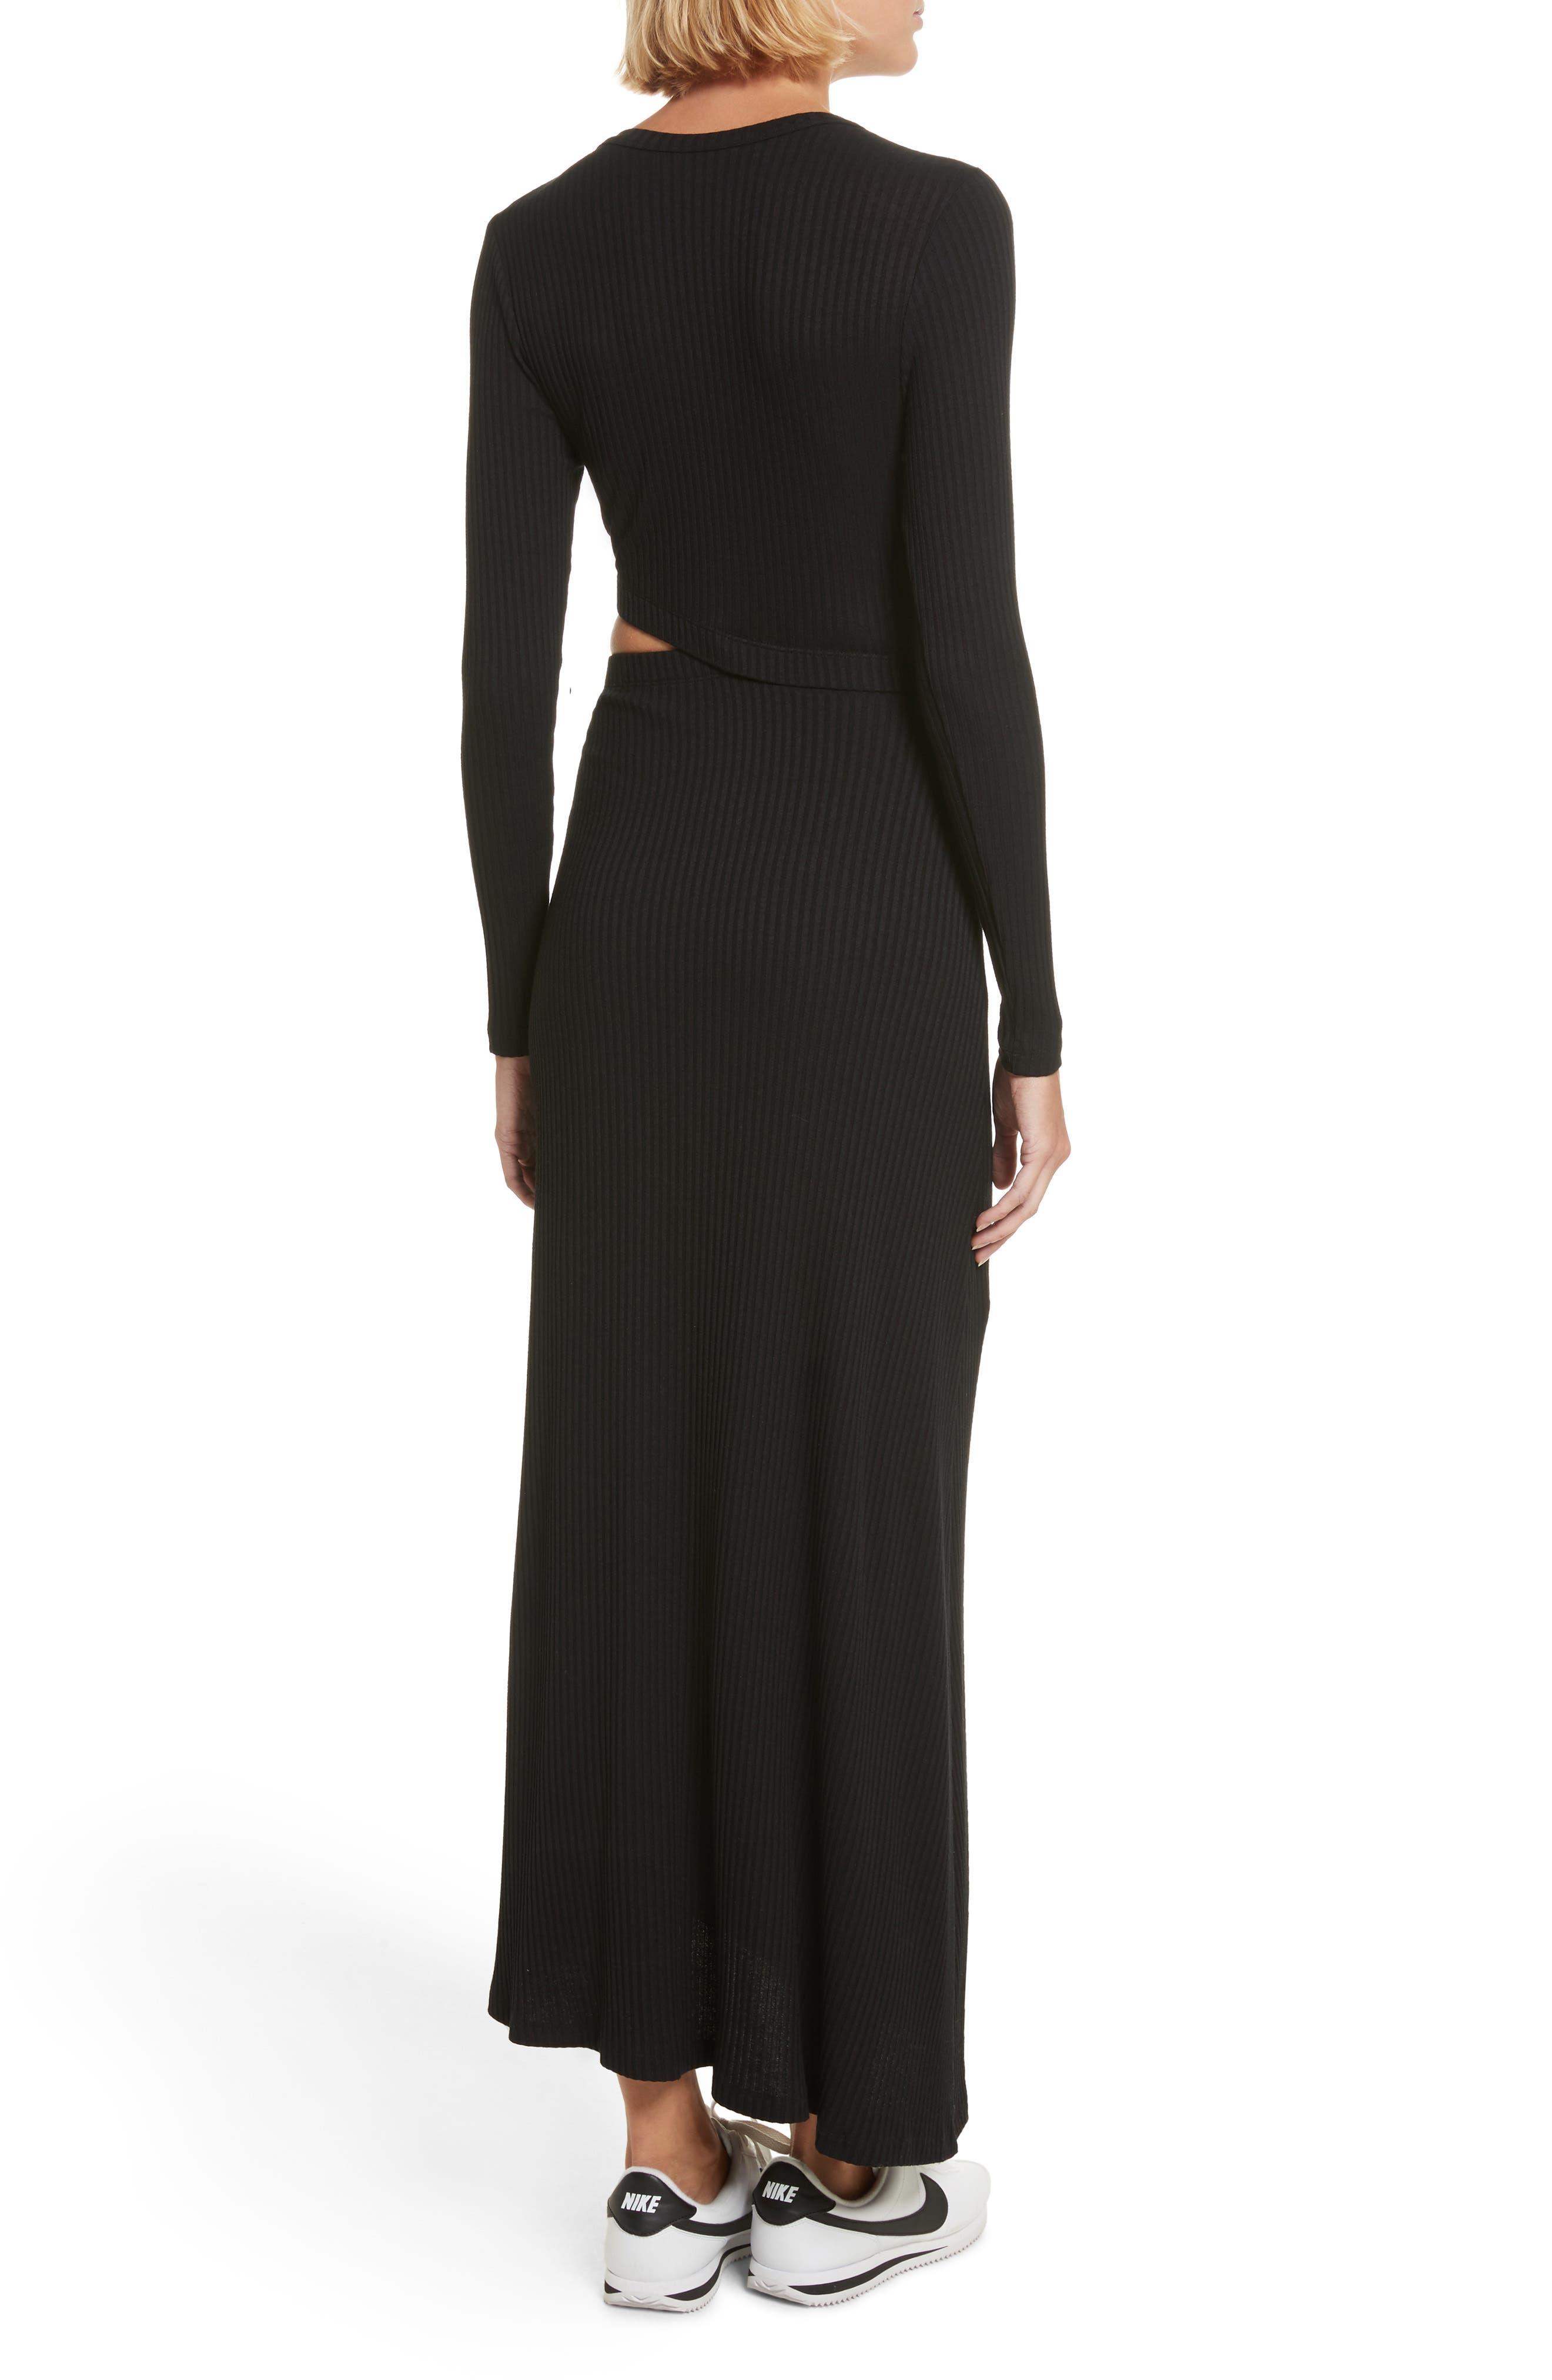 Rooney Cutout Dress,                             Alternate thumbnail 2, color,                             Black